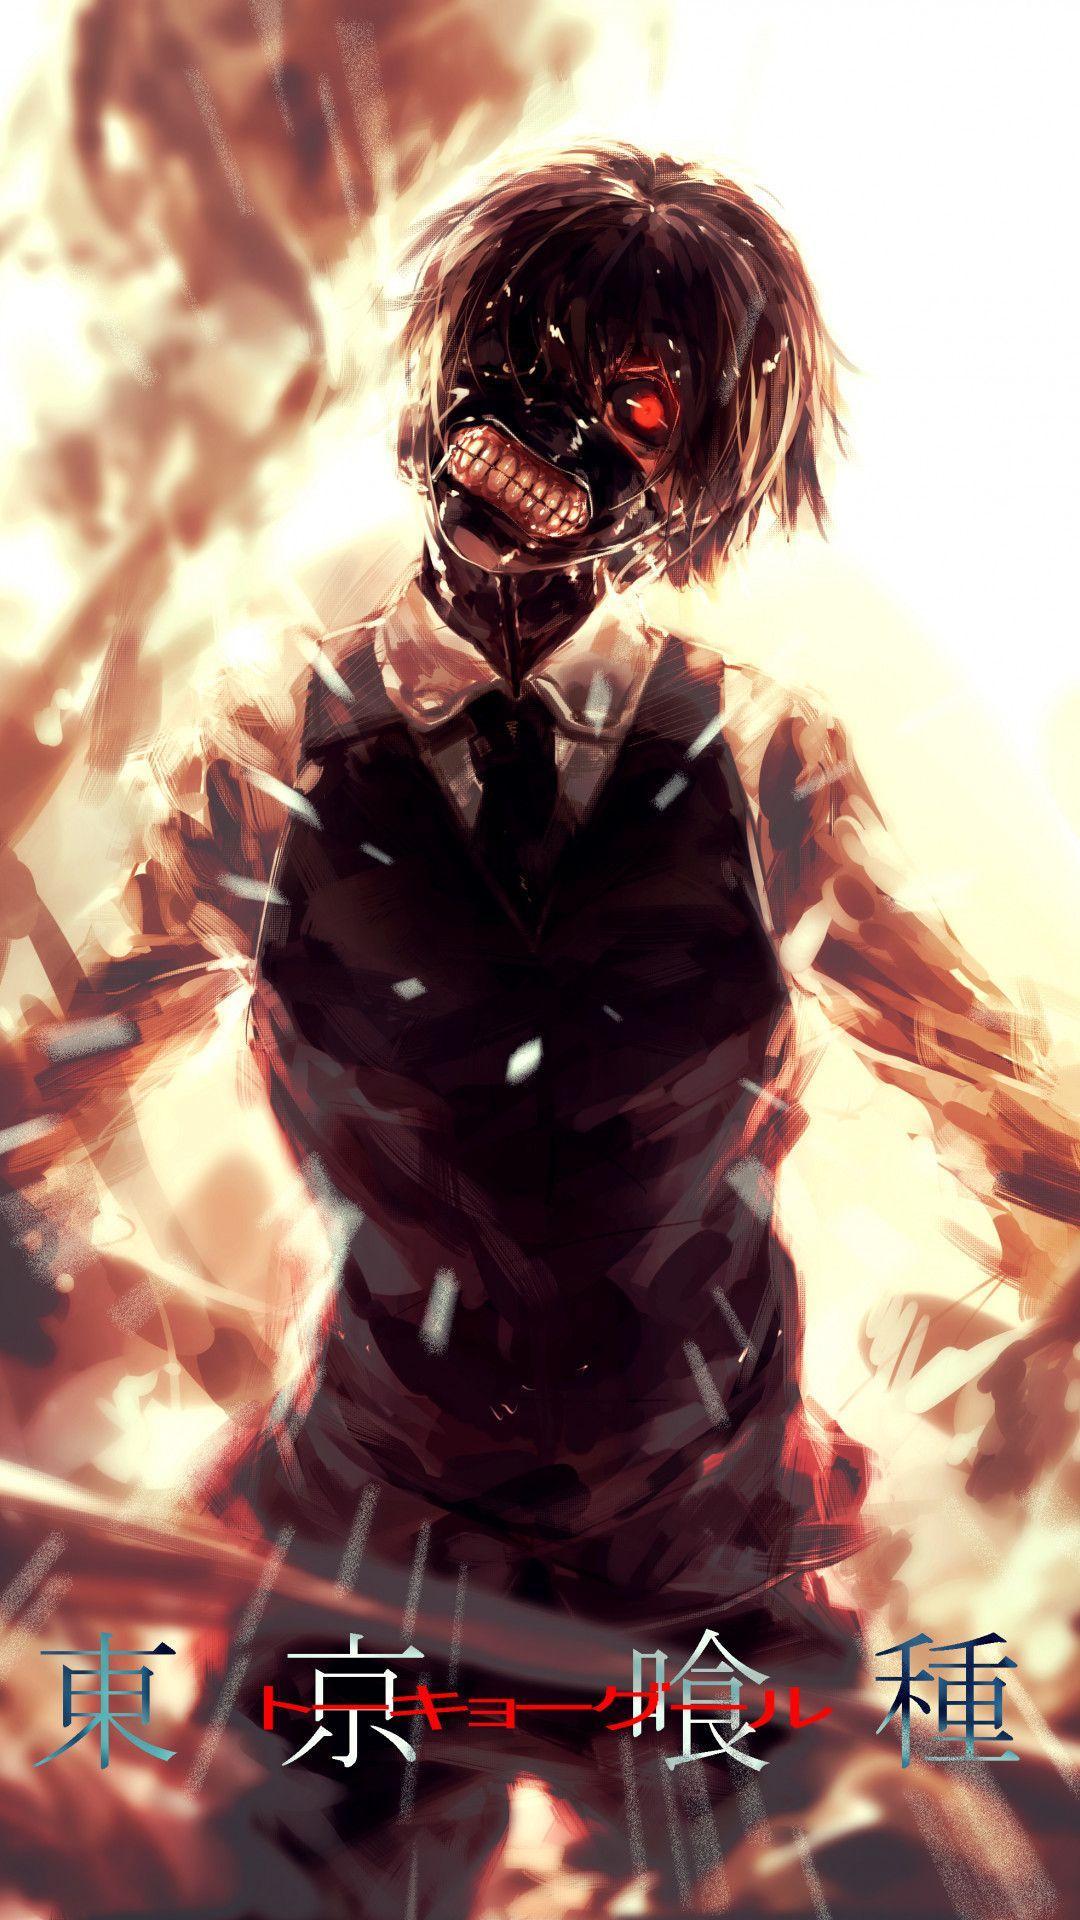 1080x1920 Tokyo Ghoul Hình nền iPhone